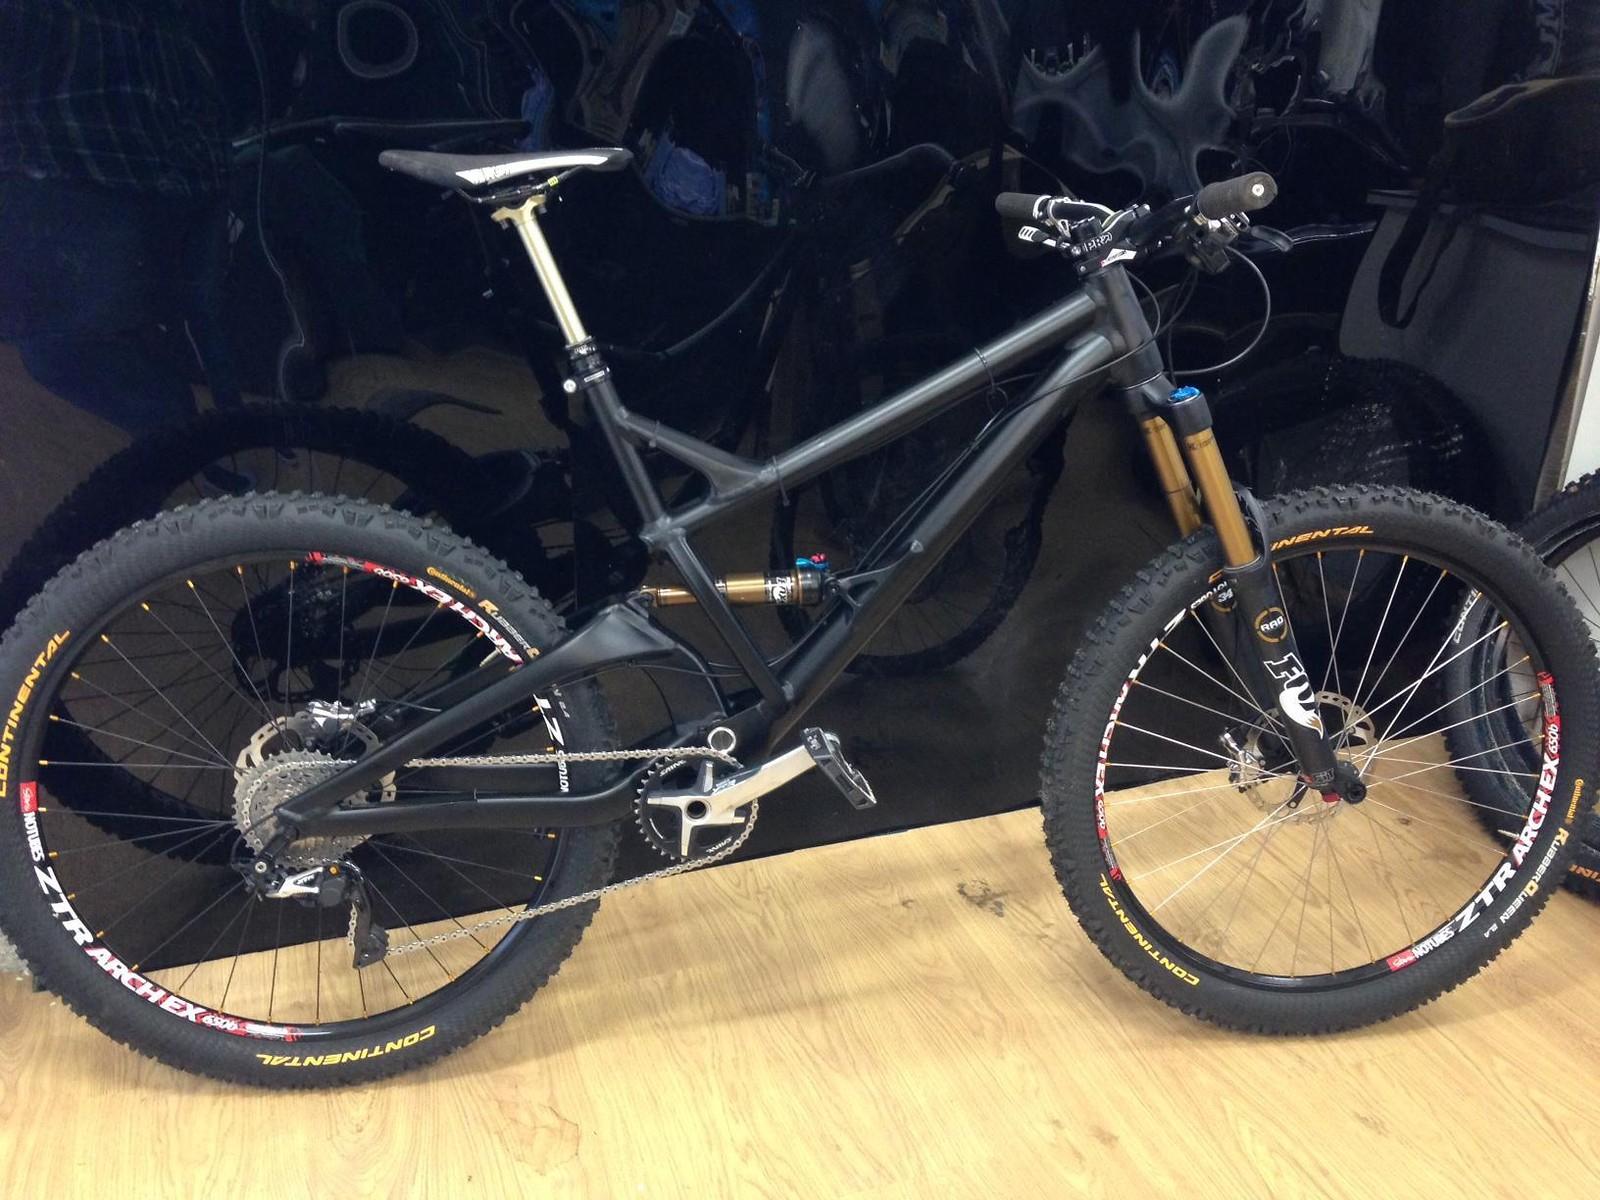 Dan Atherton's Prototype GT Enduro Race Bike - sspomer - Mountain Biking Pictures - Vital MTB